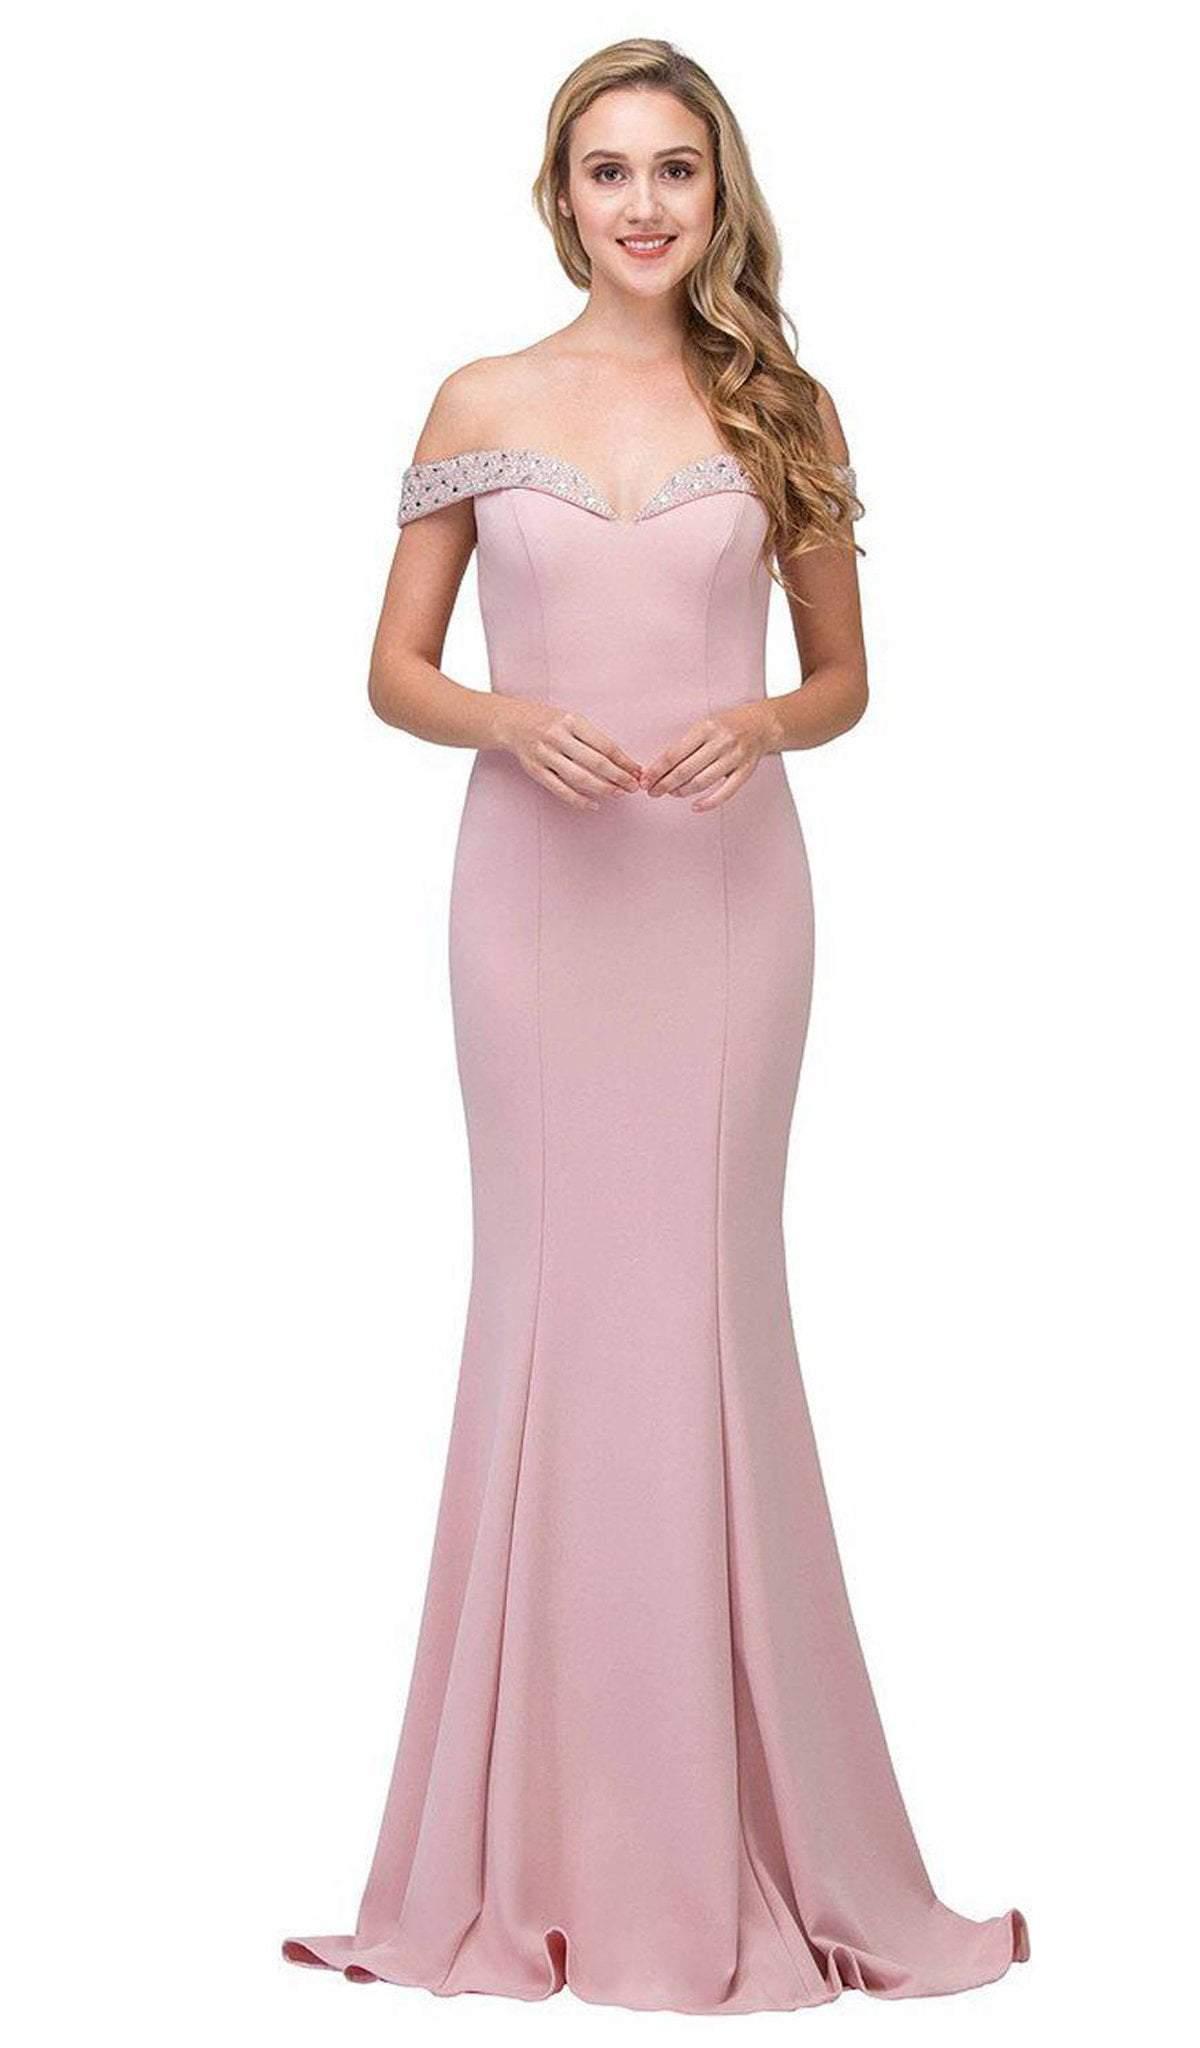 Eureka Fashion - 8100 Embellished Off-Shoulder Mermaid Dress